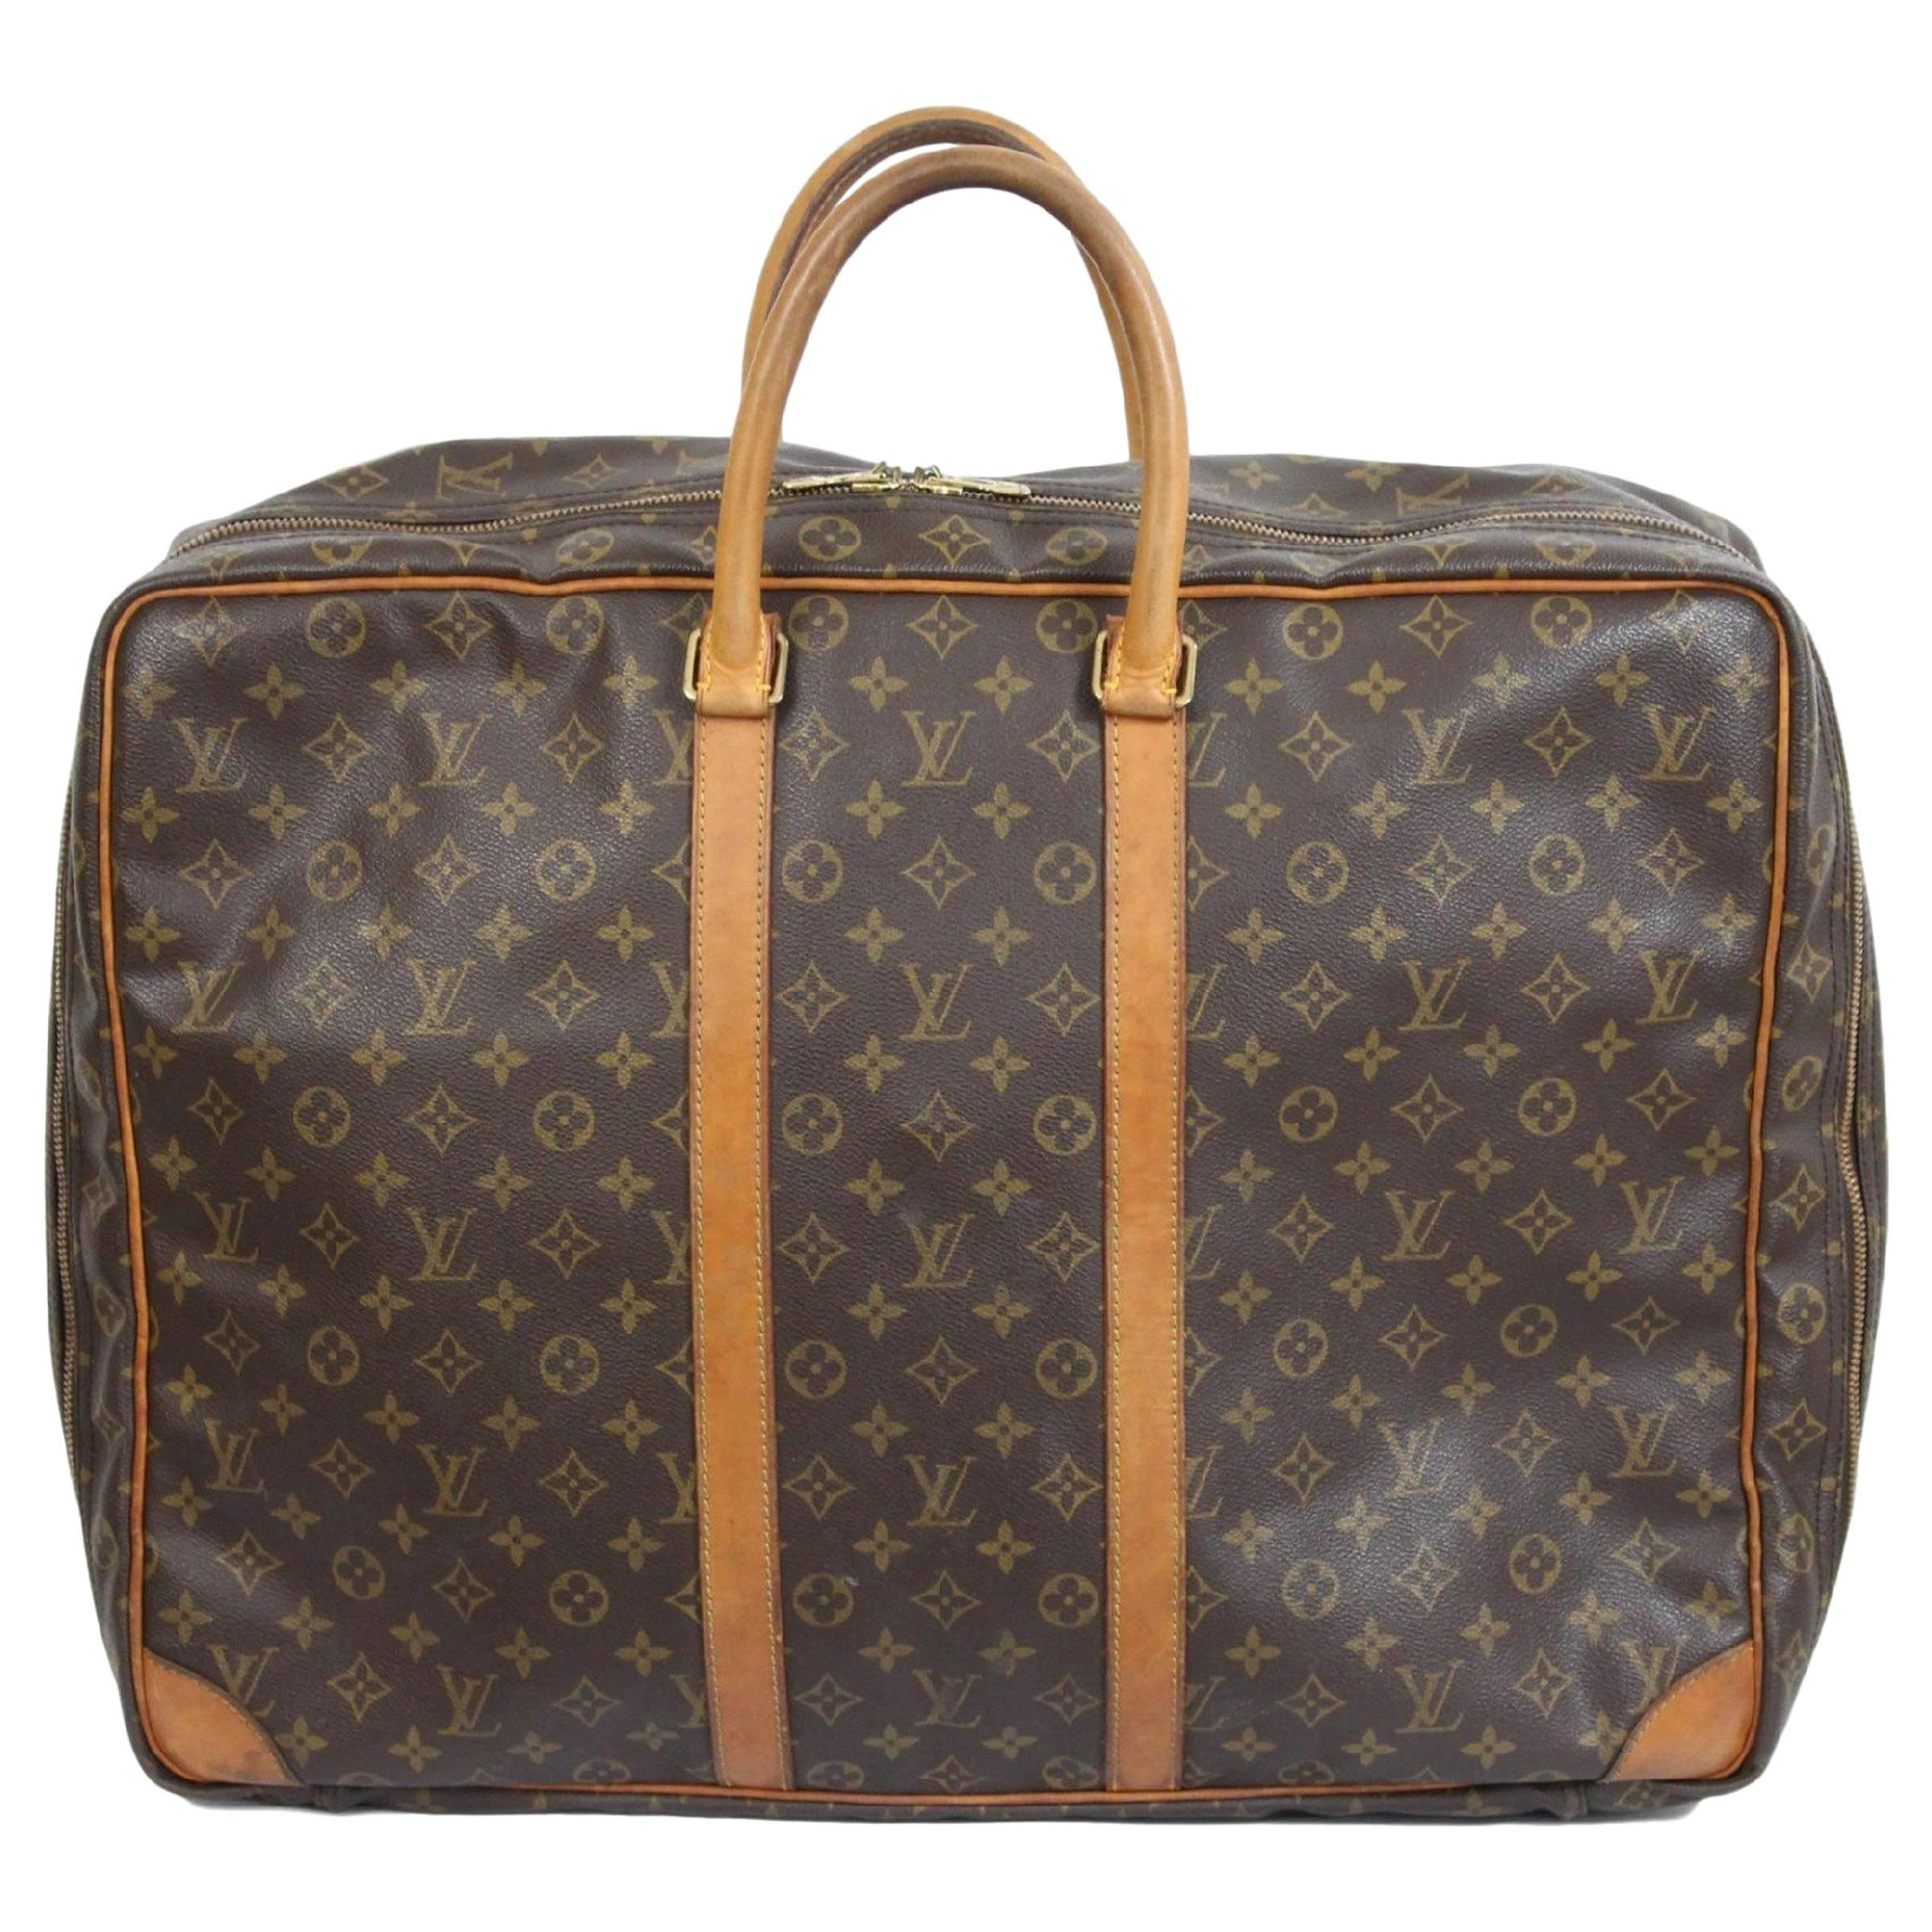 Louis Vuitton Sirius 55 Travel Bag Suitcase Brown Vintage Leather l56lMyQmP